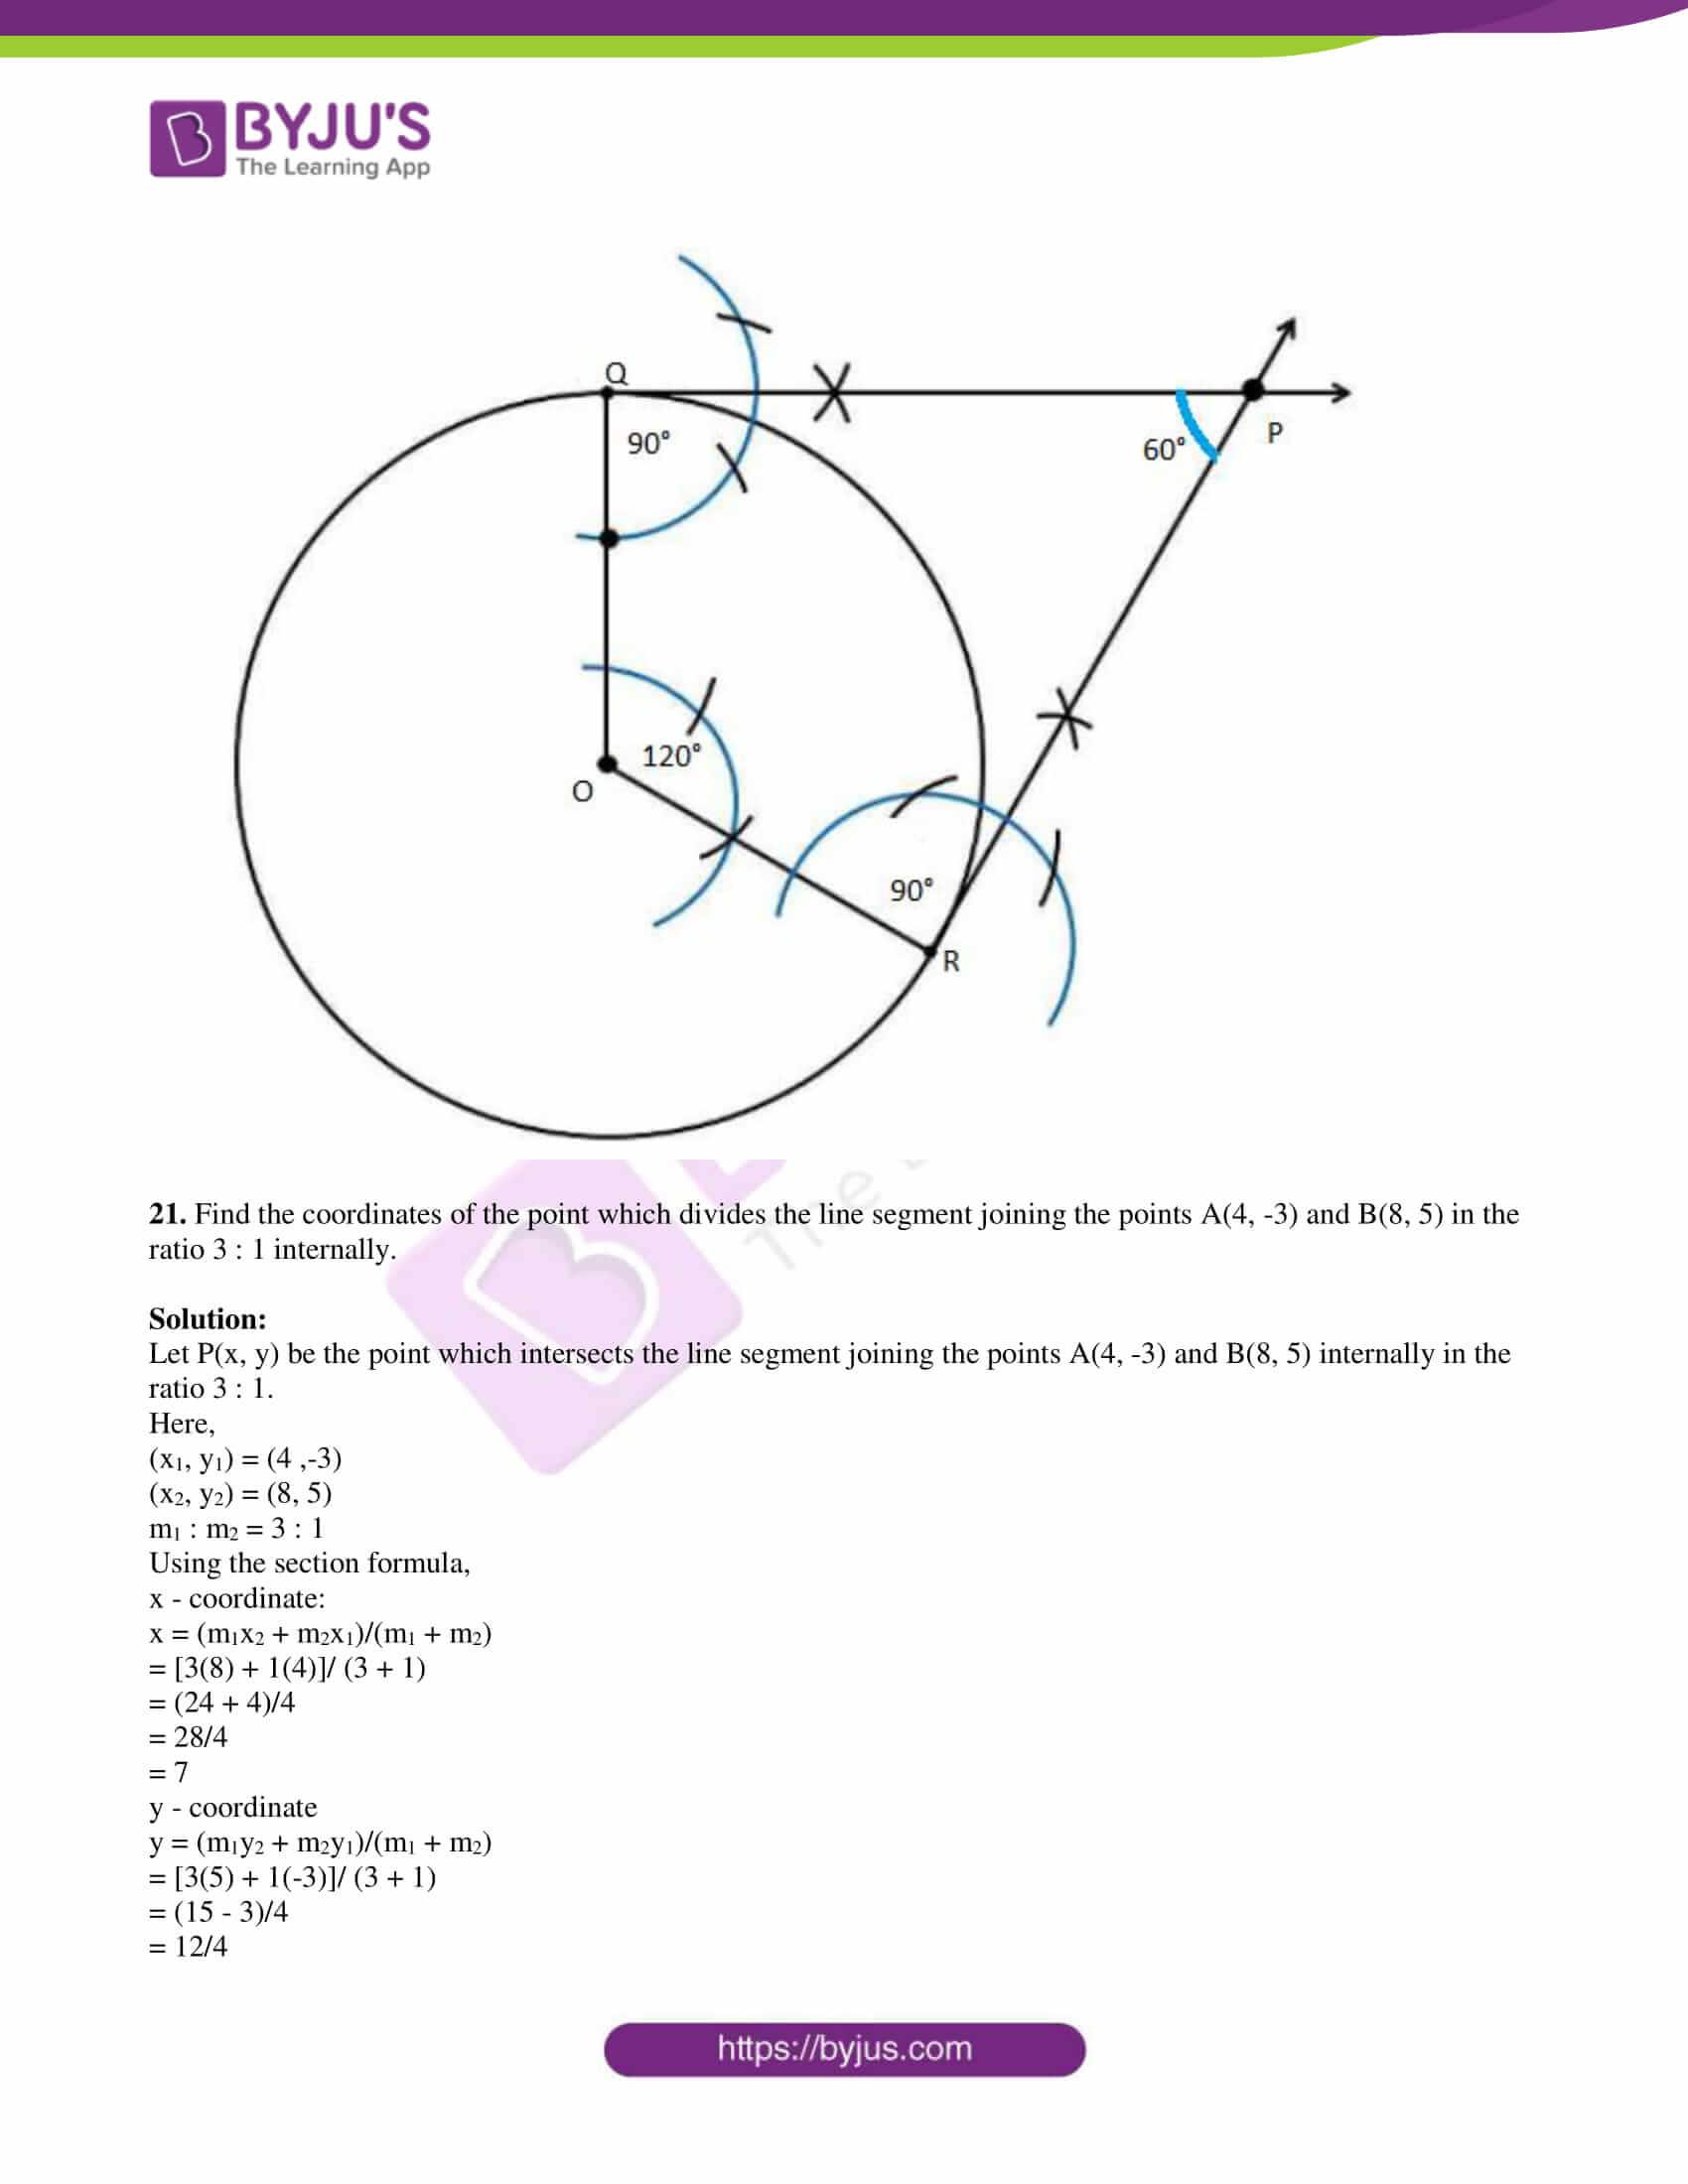 kseeb class 10 maths question paper solution 2019 10